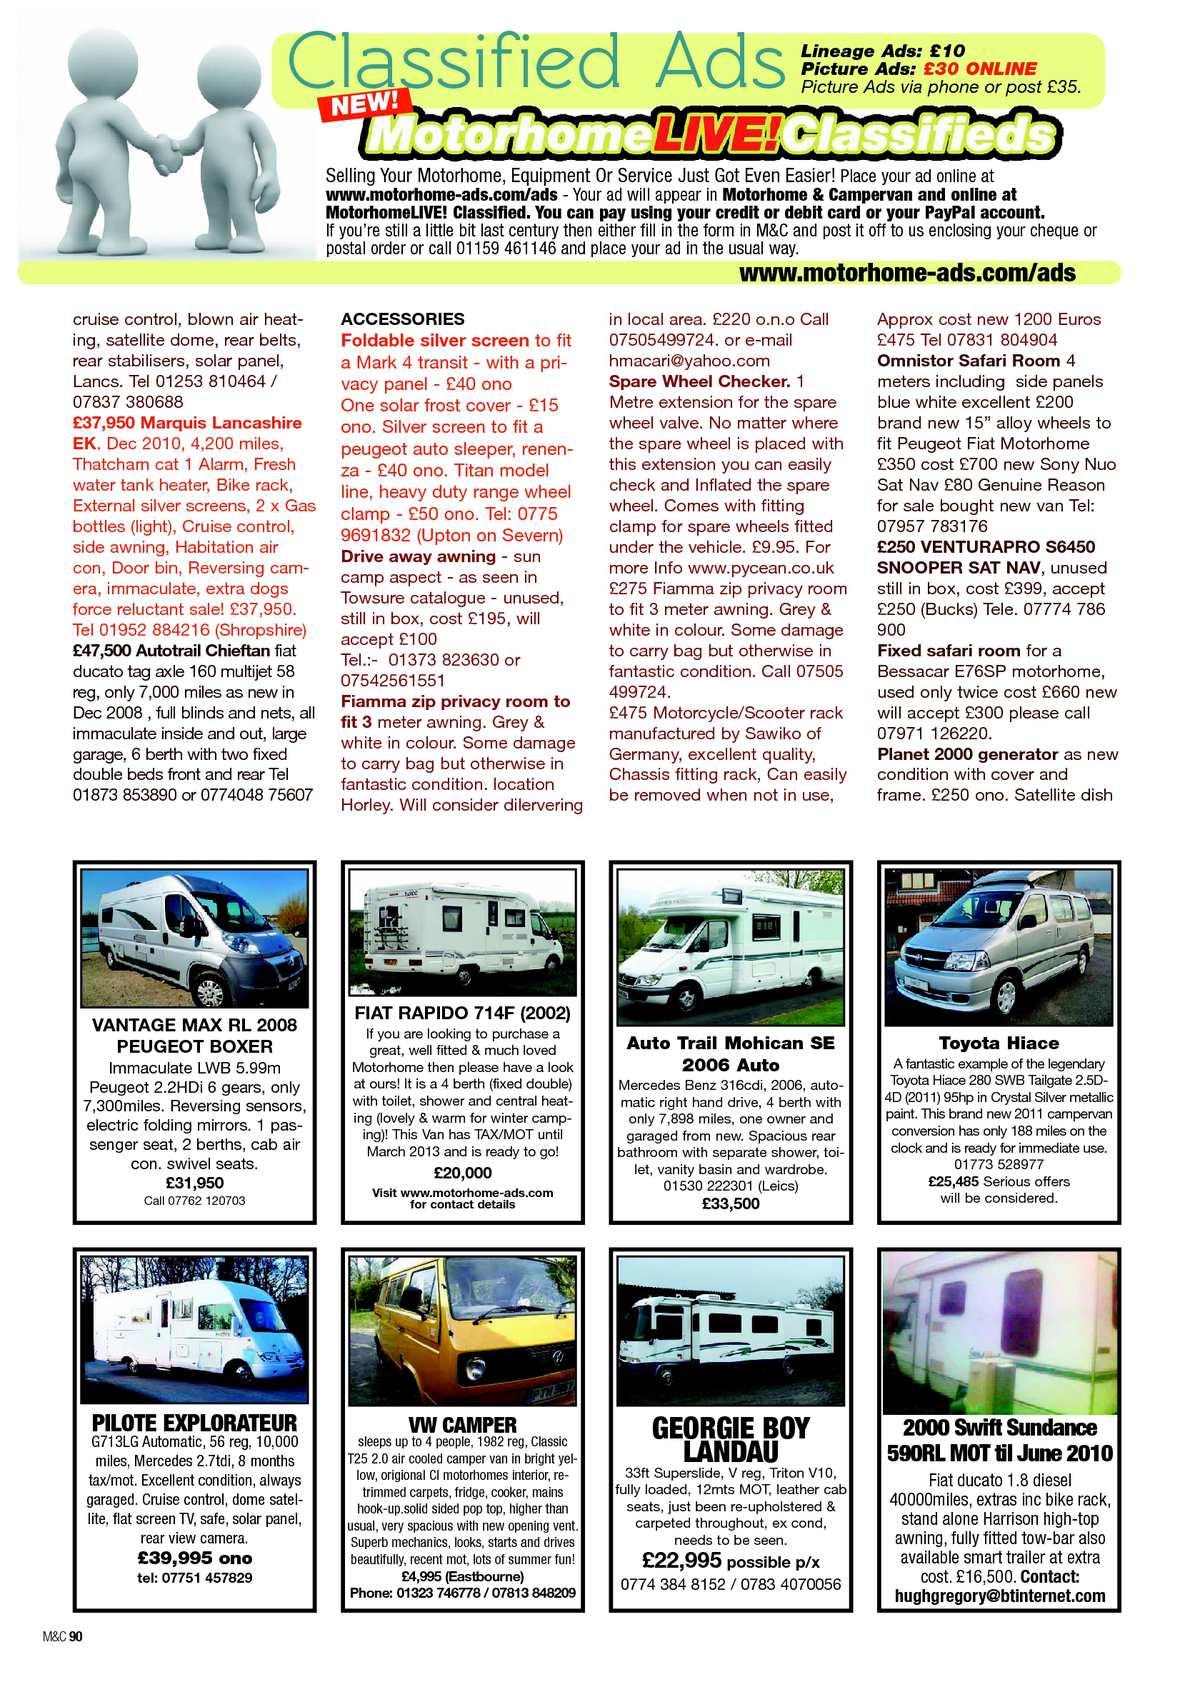 Feb 2013 motorhome campervan calameo downloader page 92 fandeluxe Gallery